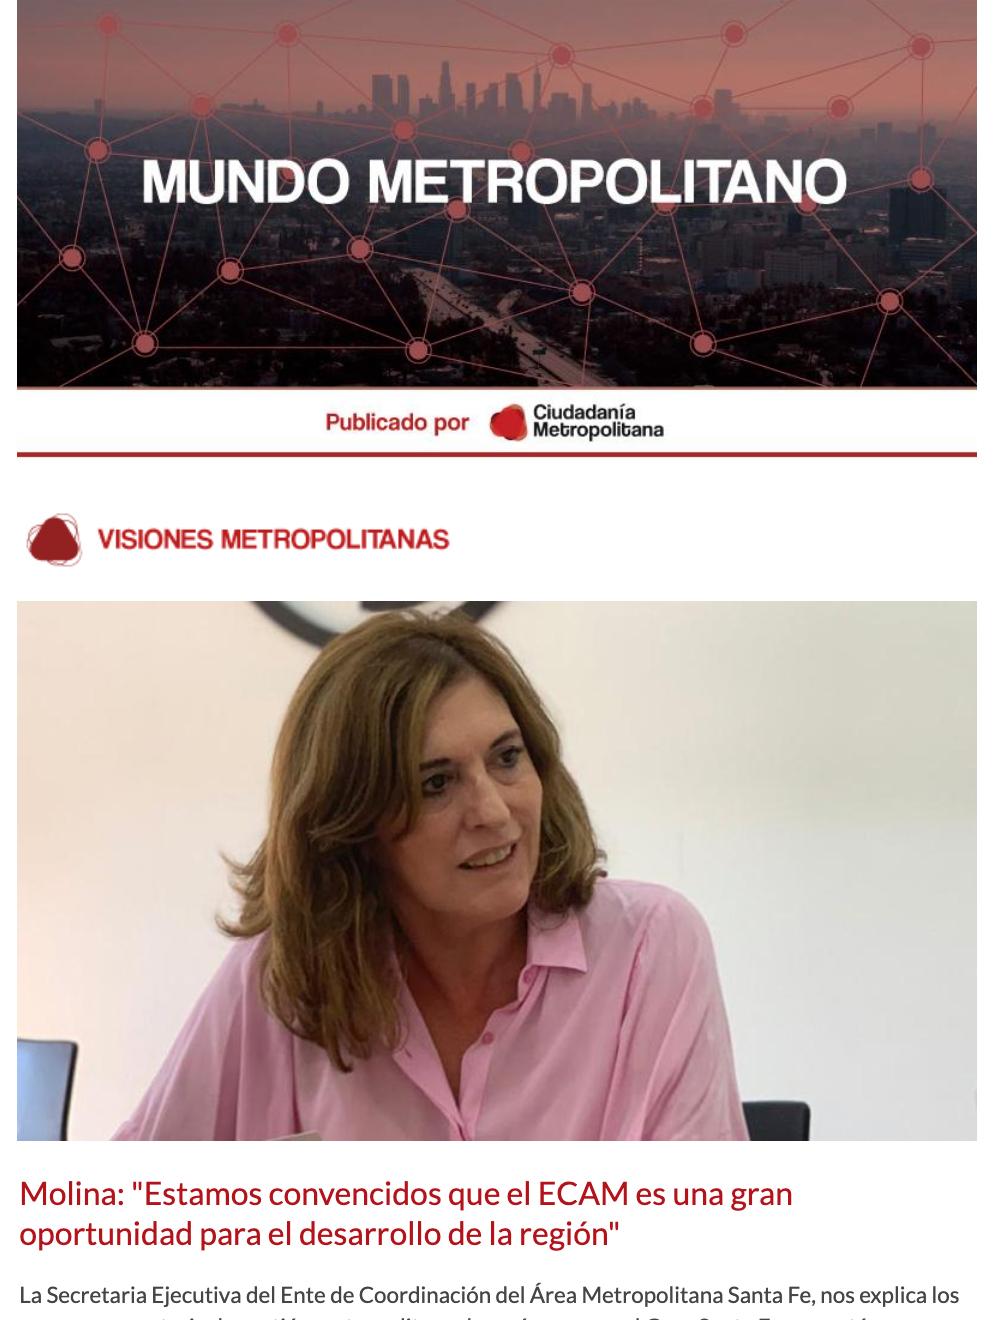 Newsletter Mundo Metropolitano 5